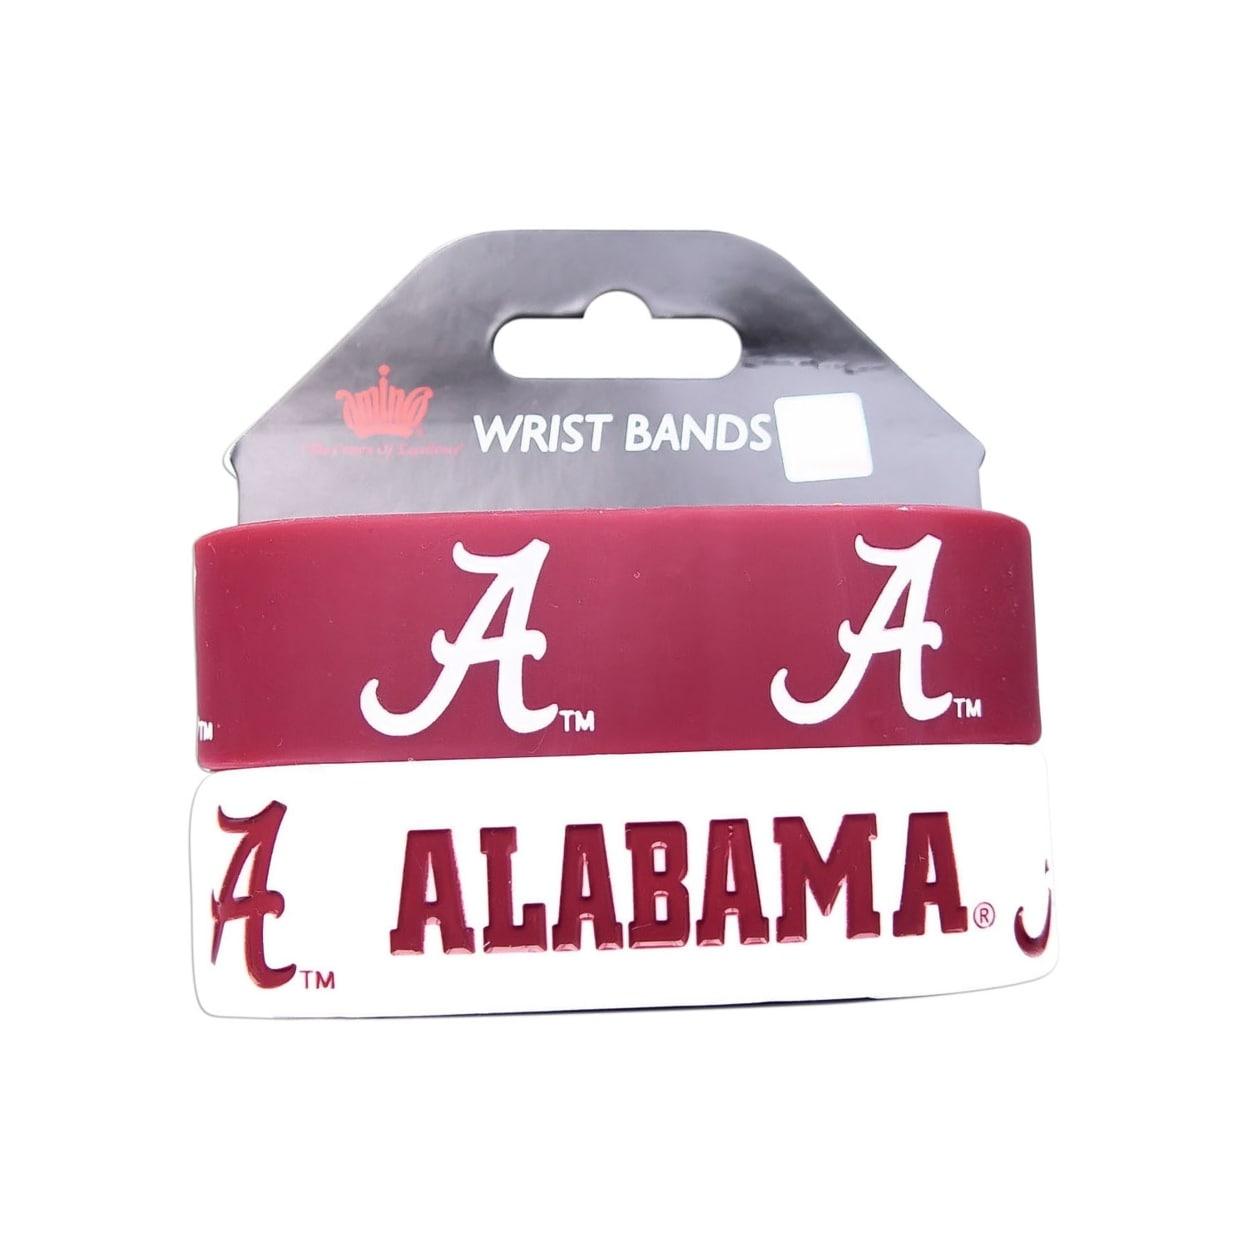 Alabama Tide Rubber Wrist Band (Set of 2) NCAA